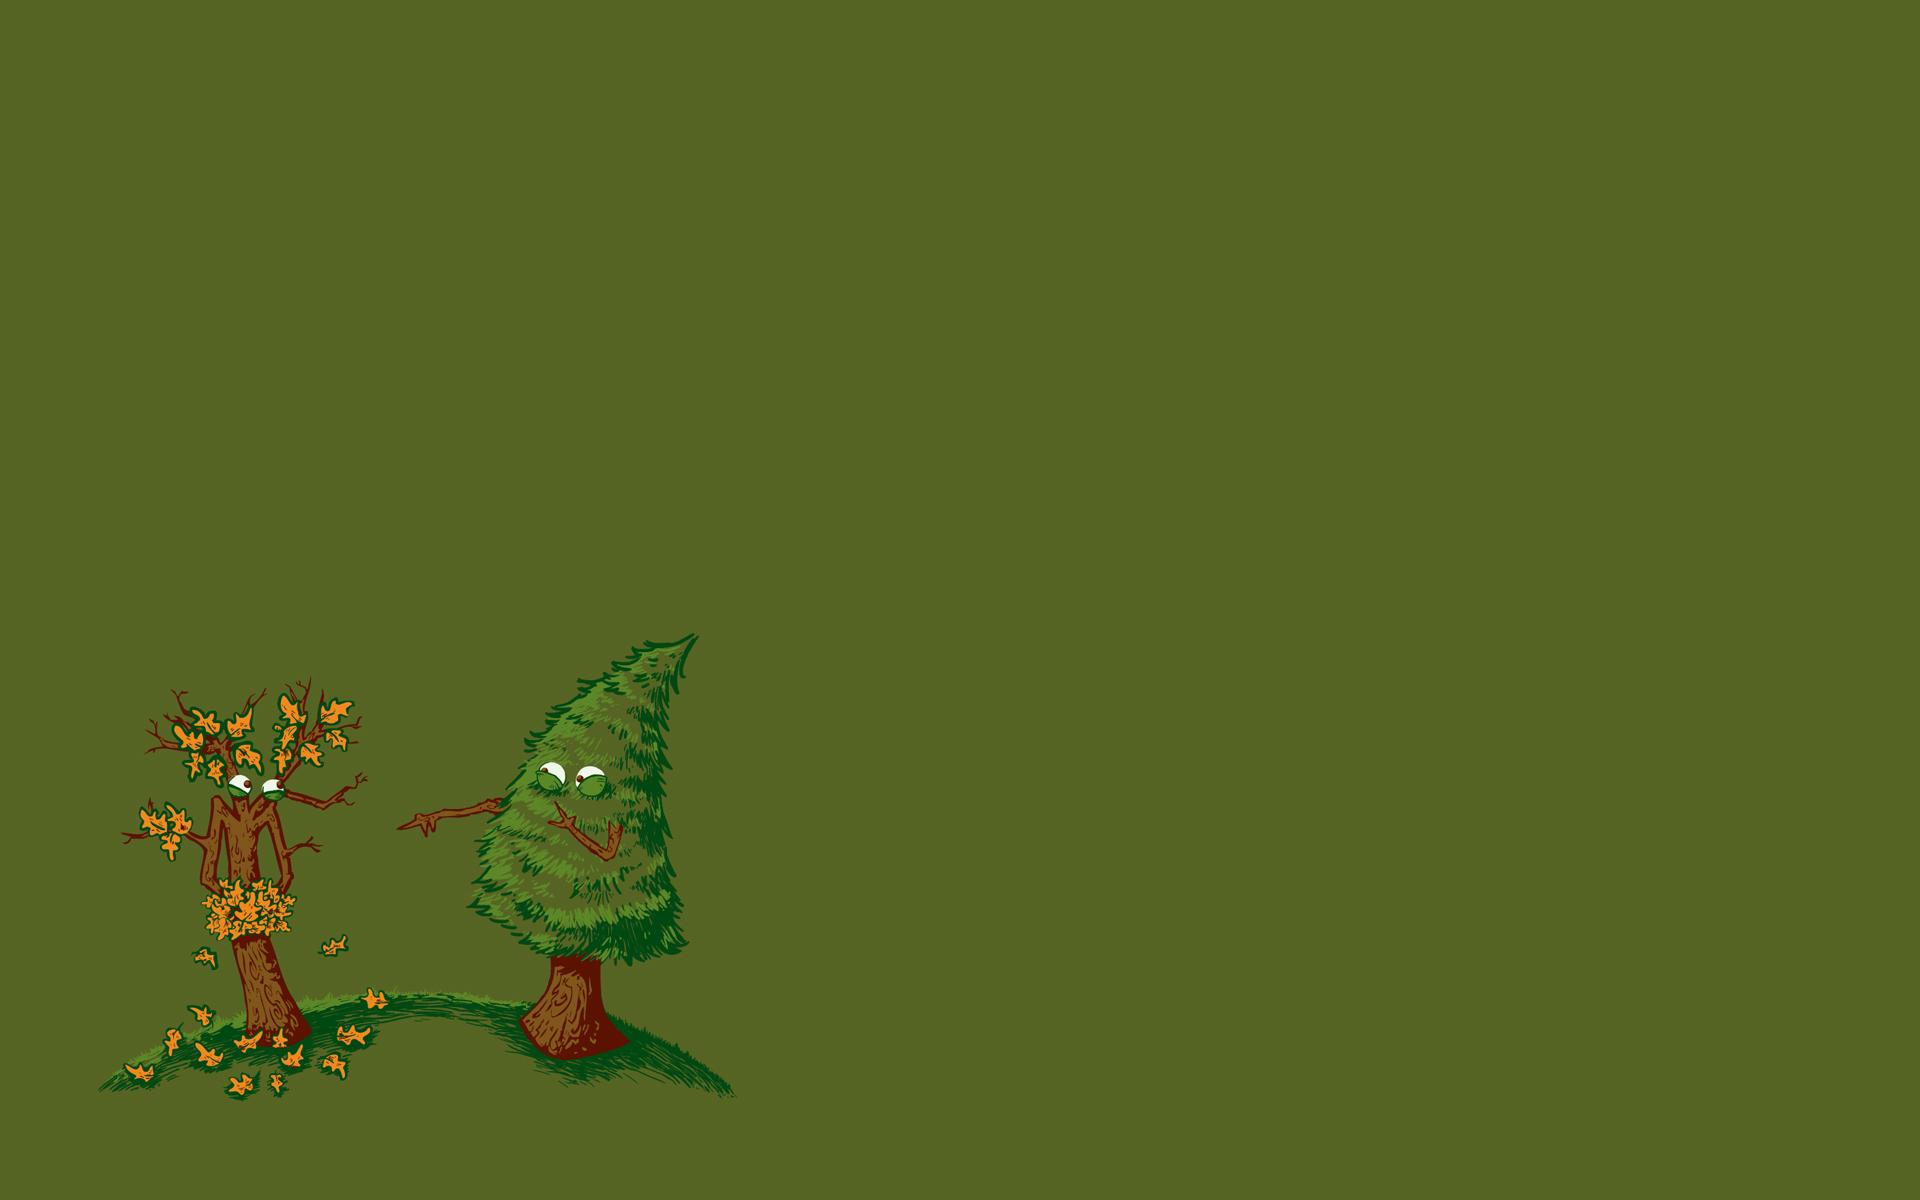 Tree Humor Wallpapers Tree Humor Myspace Backgrounds Tree Humor 1920x1200